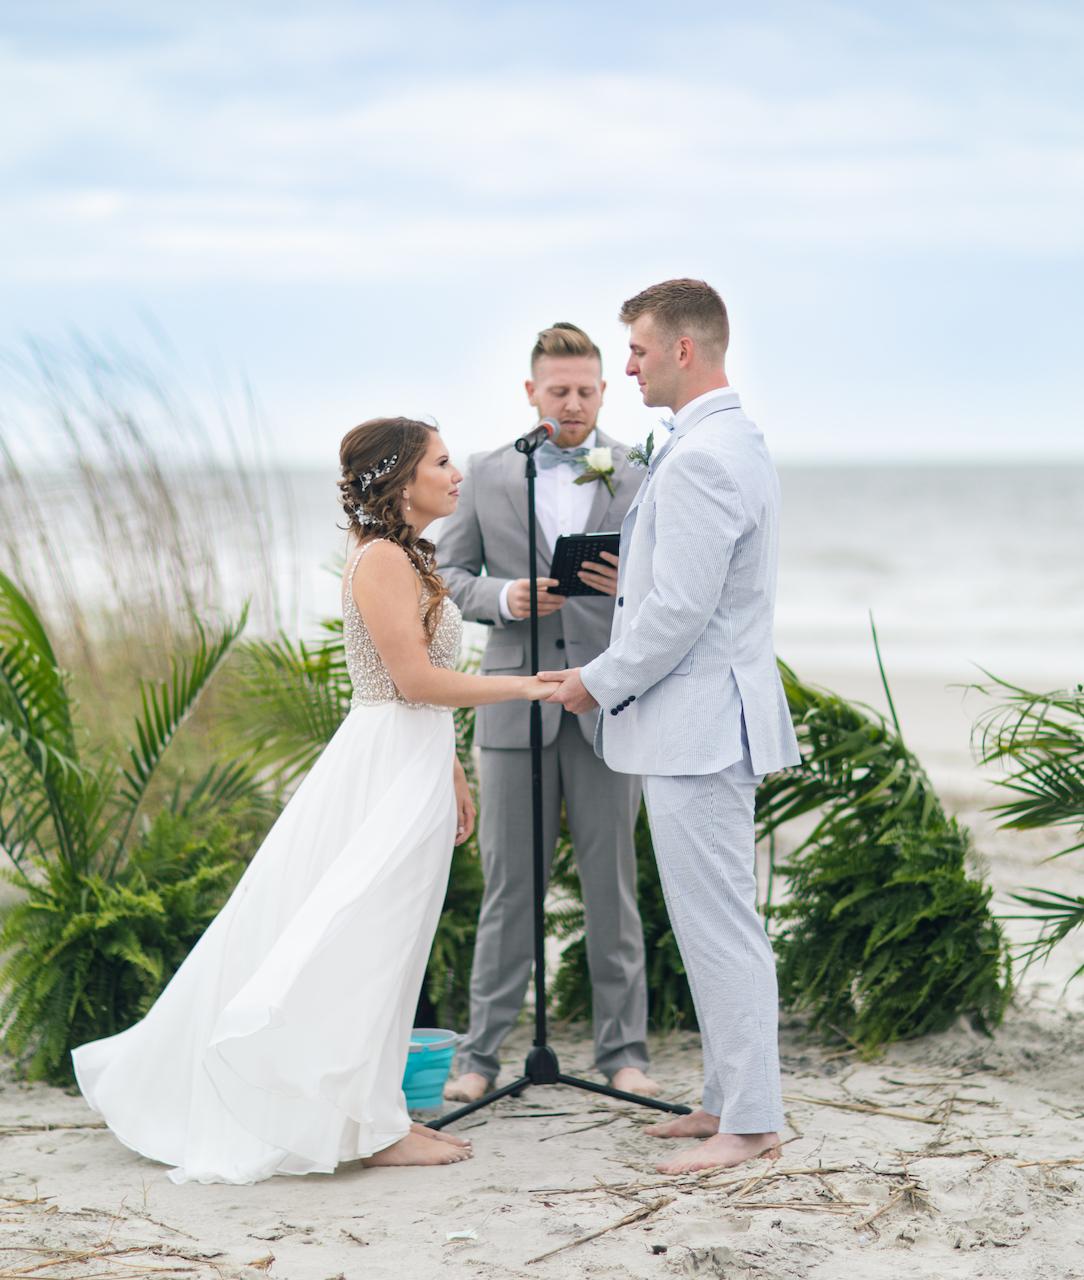 hilton-head-island-wedding-sc-ceremony107.jpg